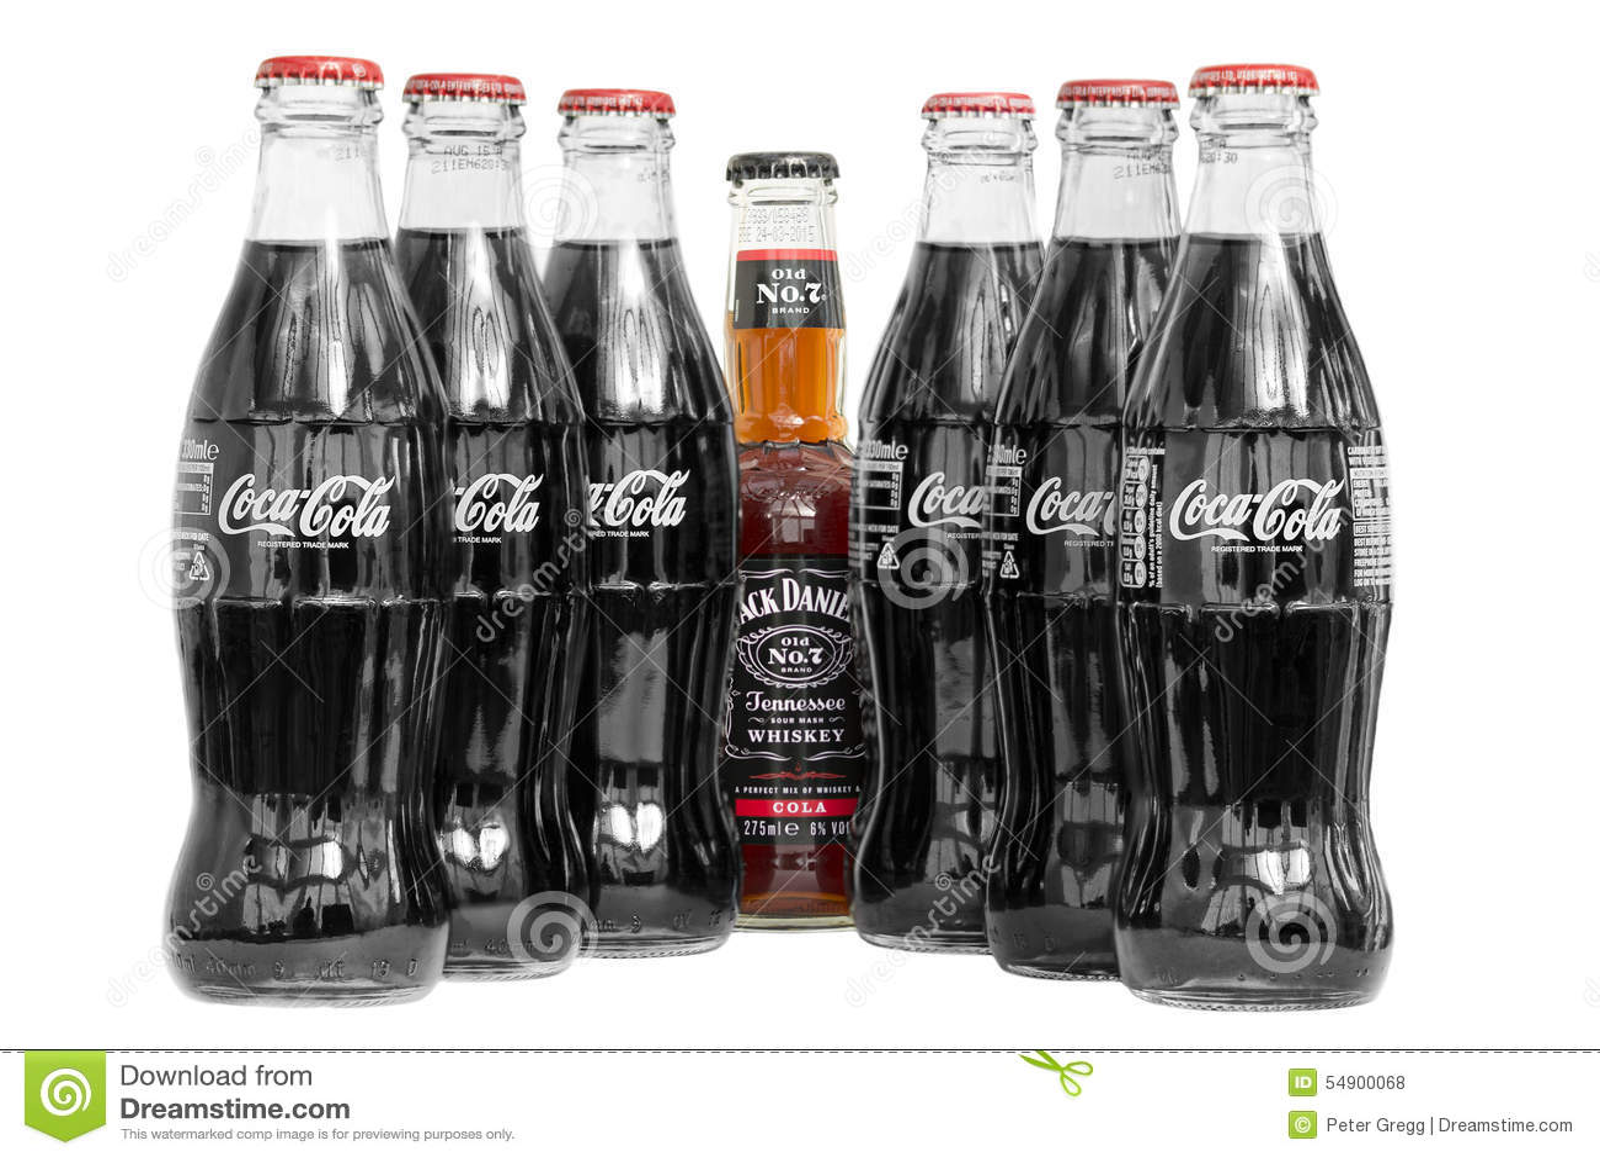 Jack Daniels and coke and coke bottles